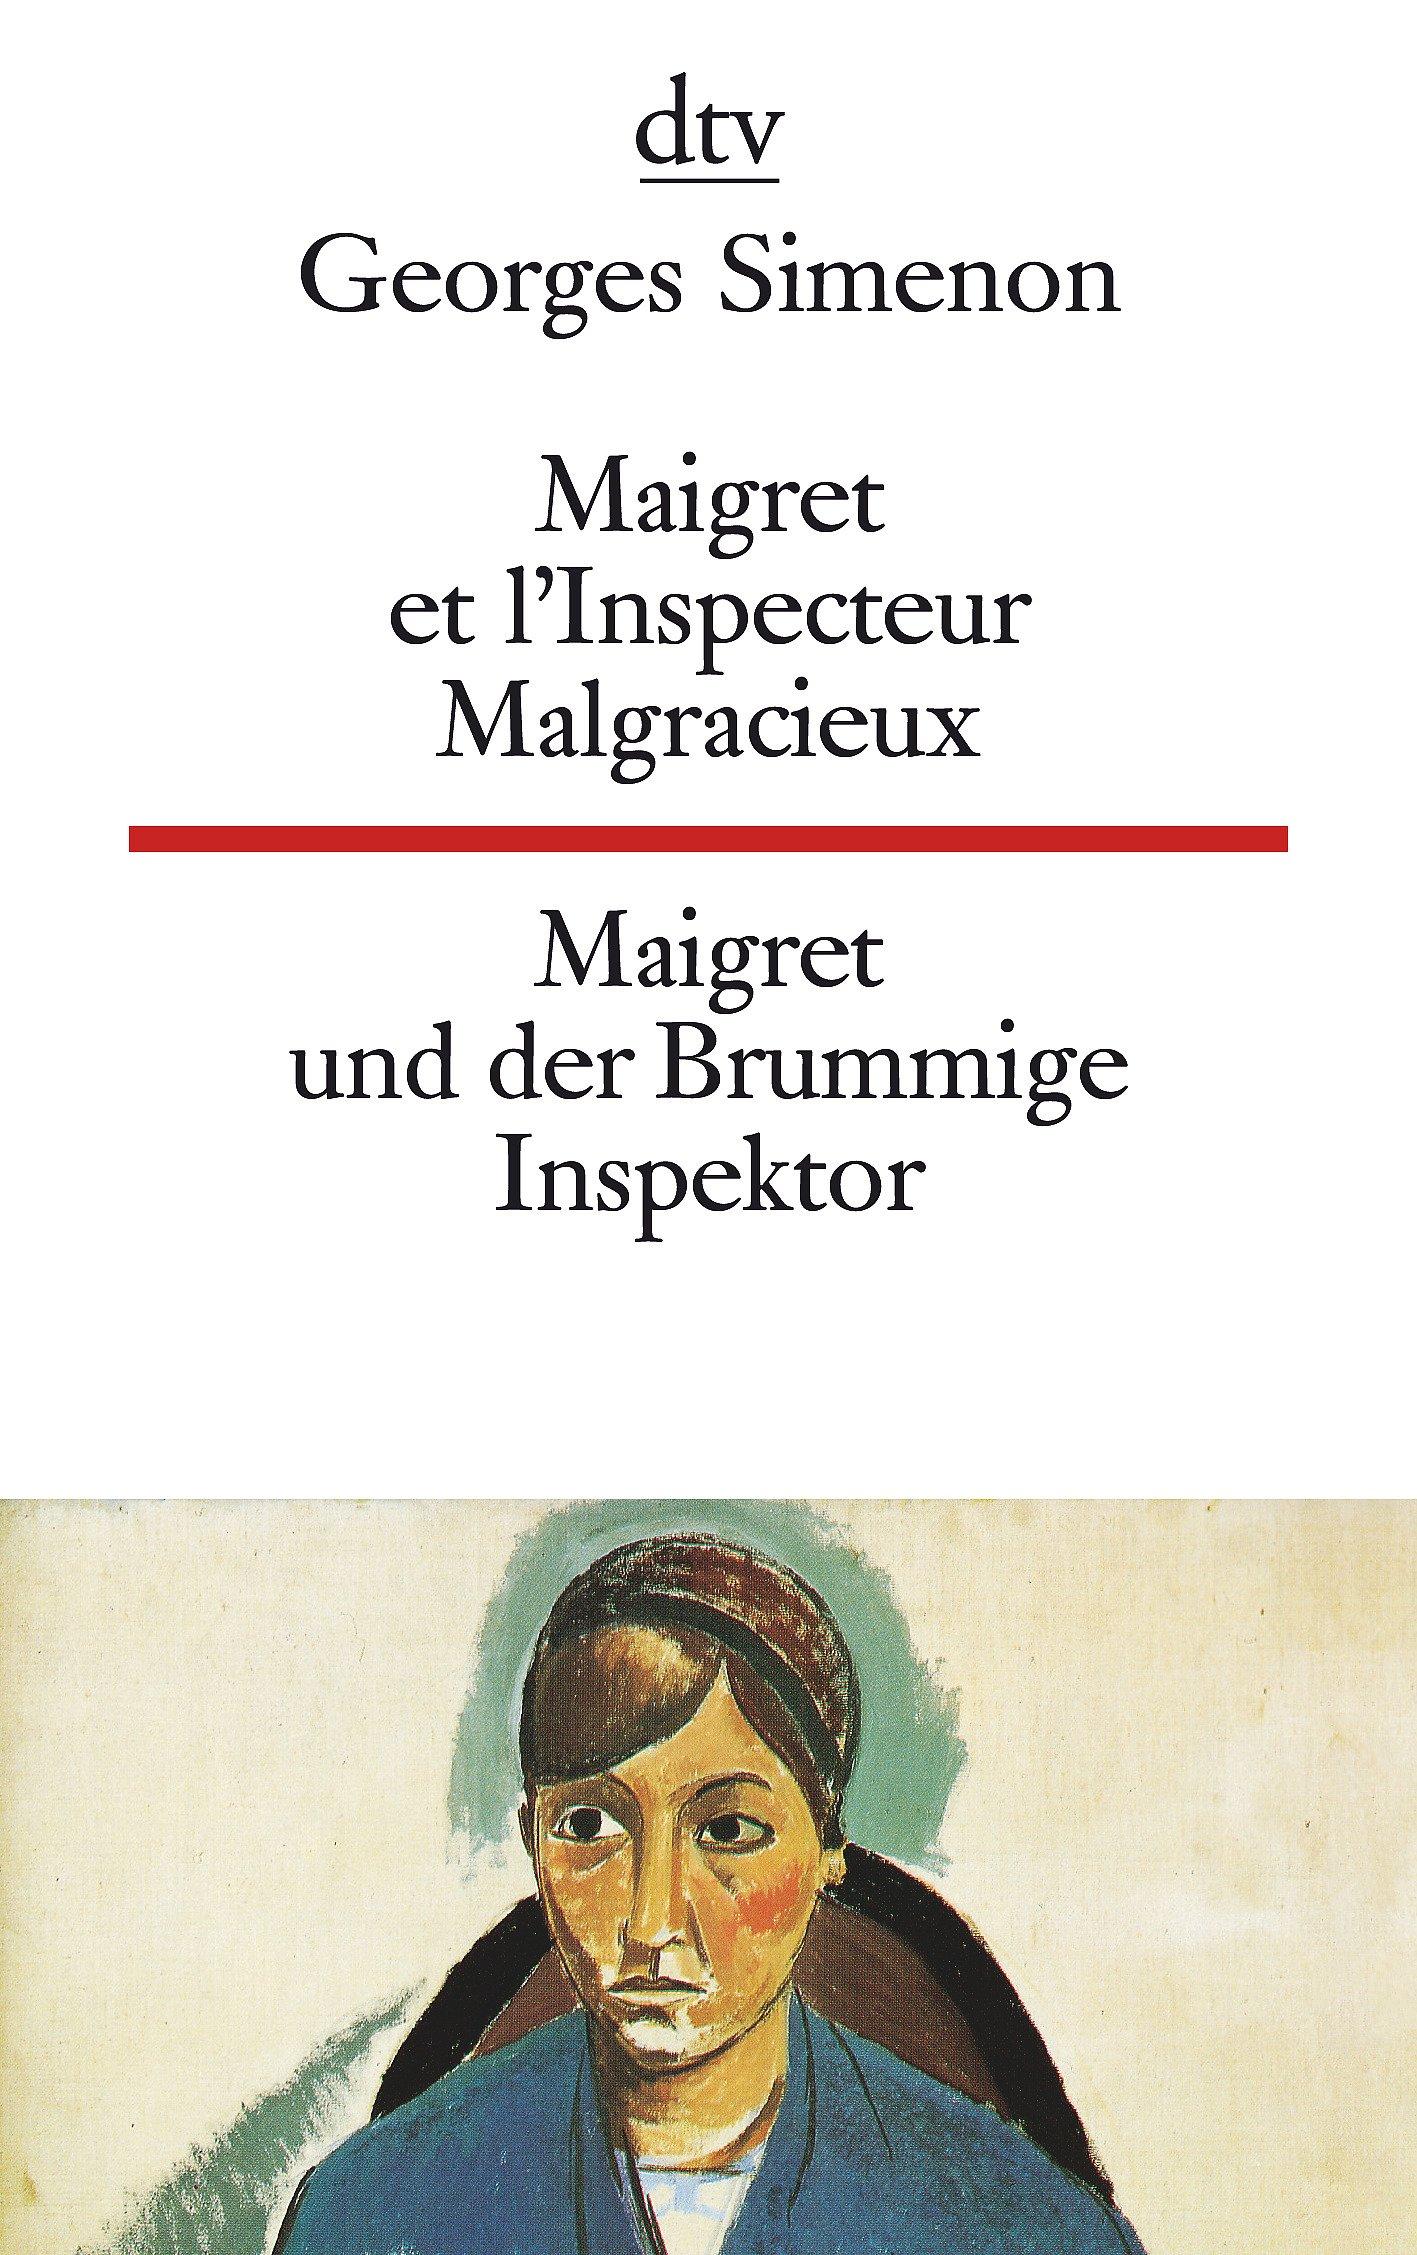 Maigret et l'Inspecteur Malgracieux Maigret und der Brummige Inspektor